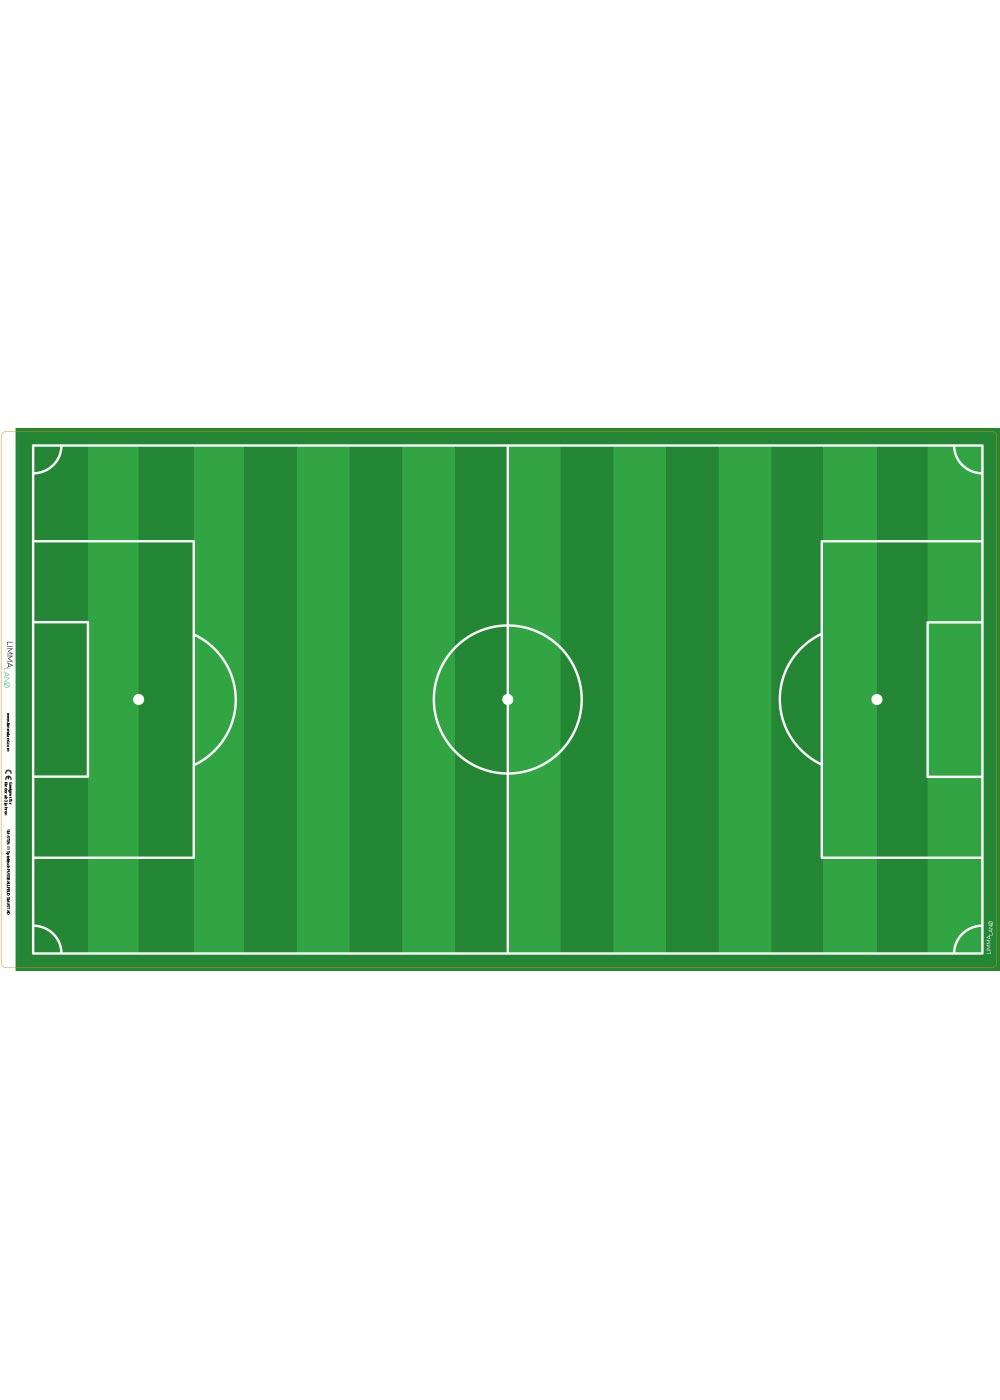 Ikea Smastad Bank Fussballfeld grün Druckvorlage